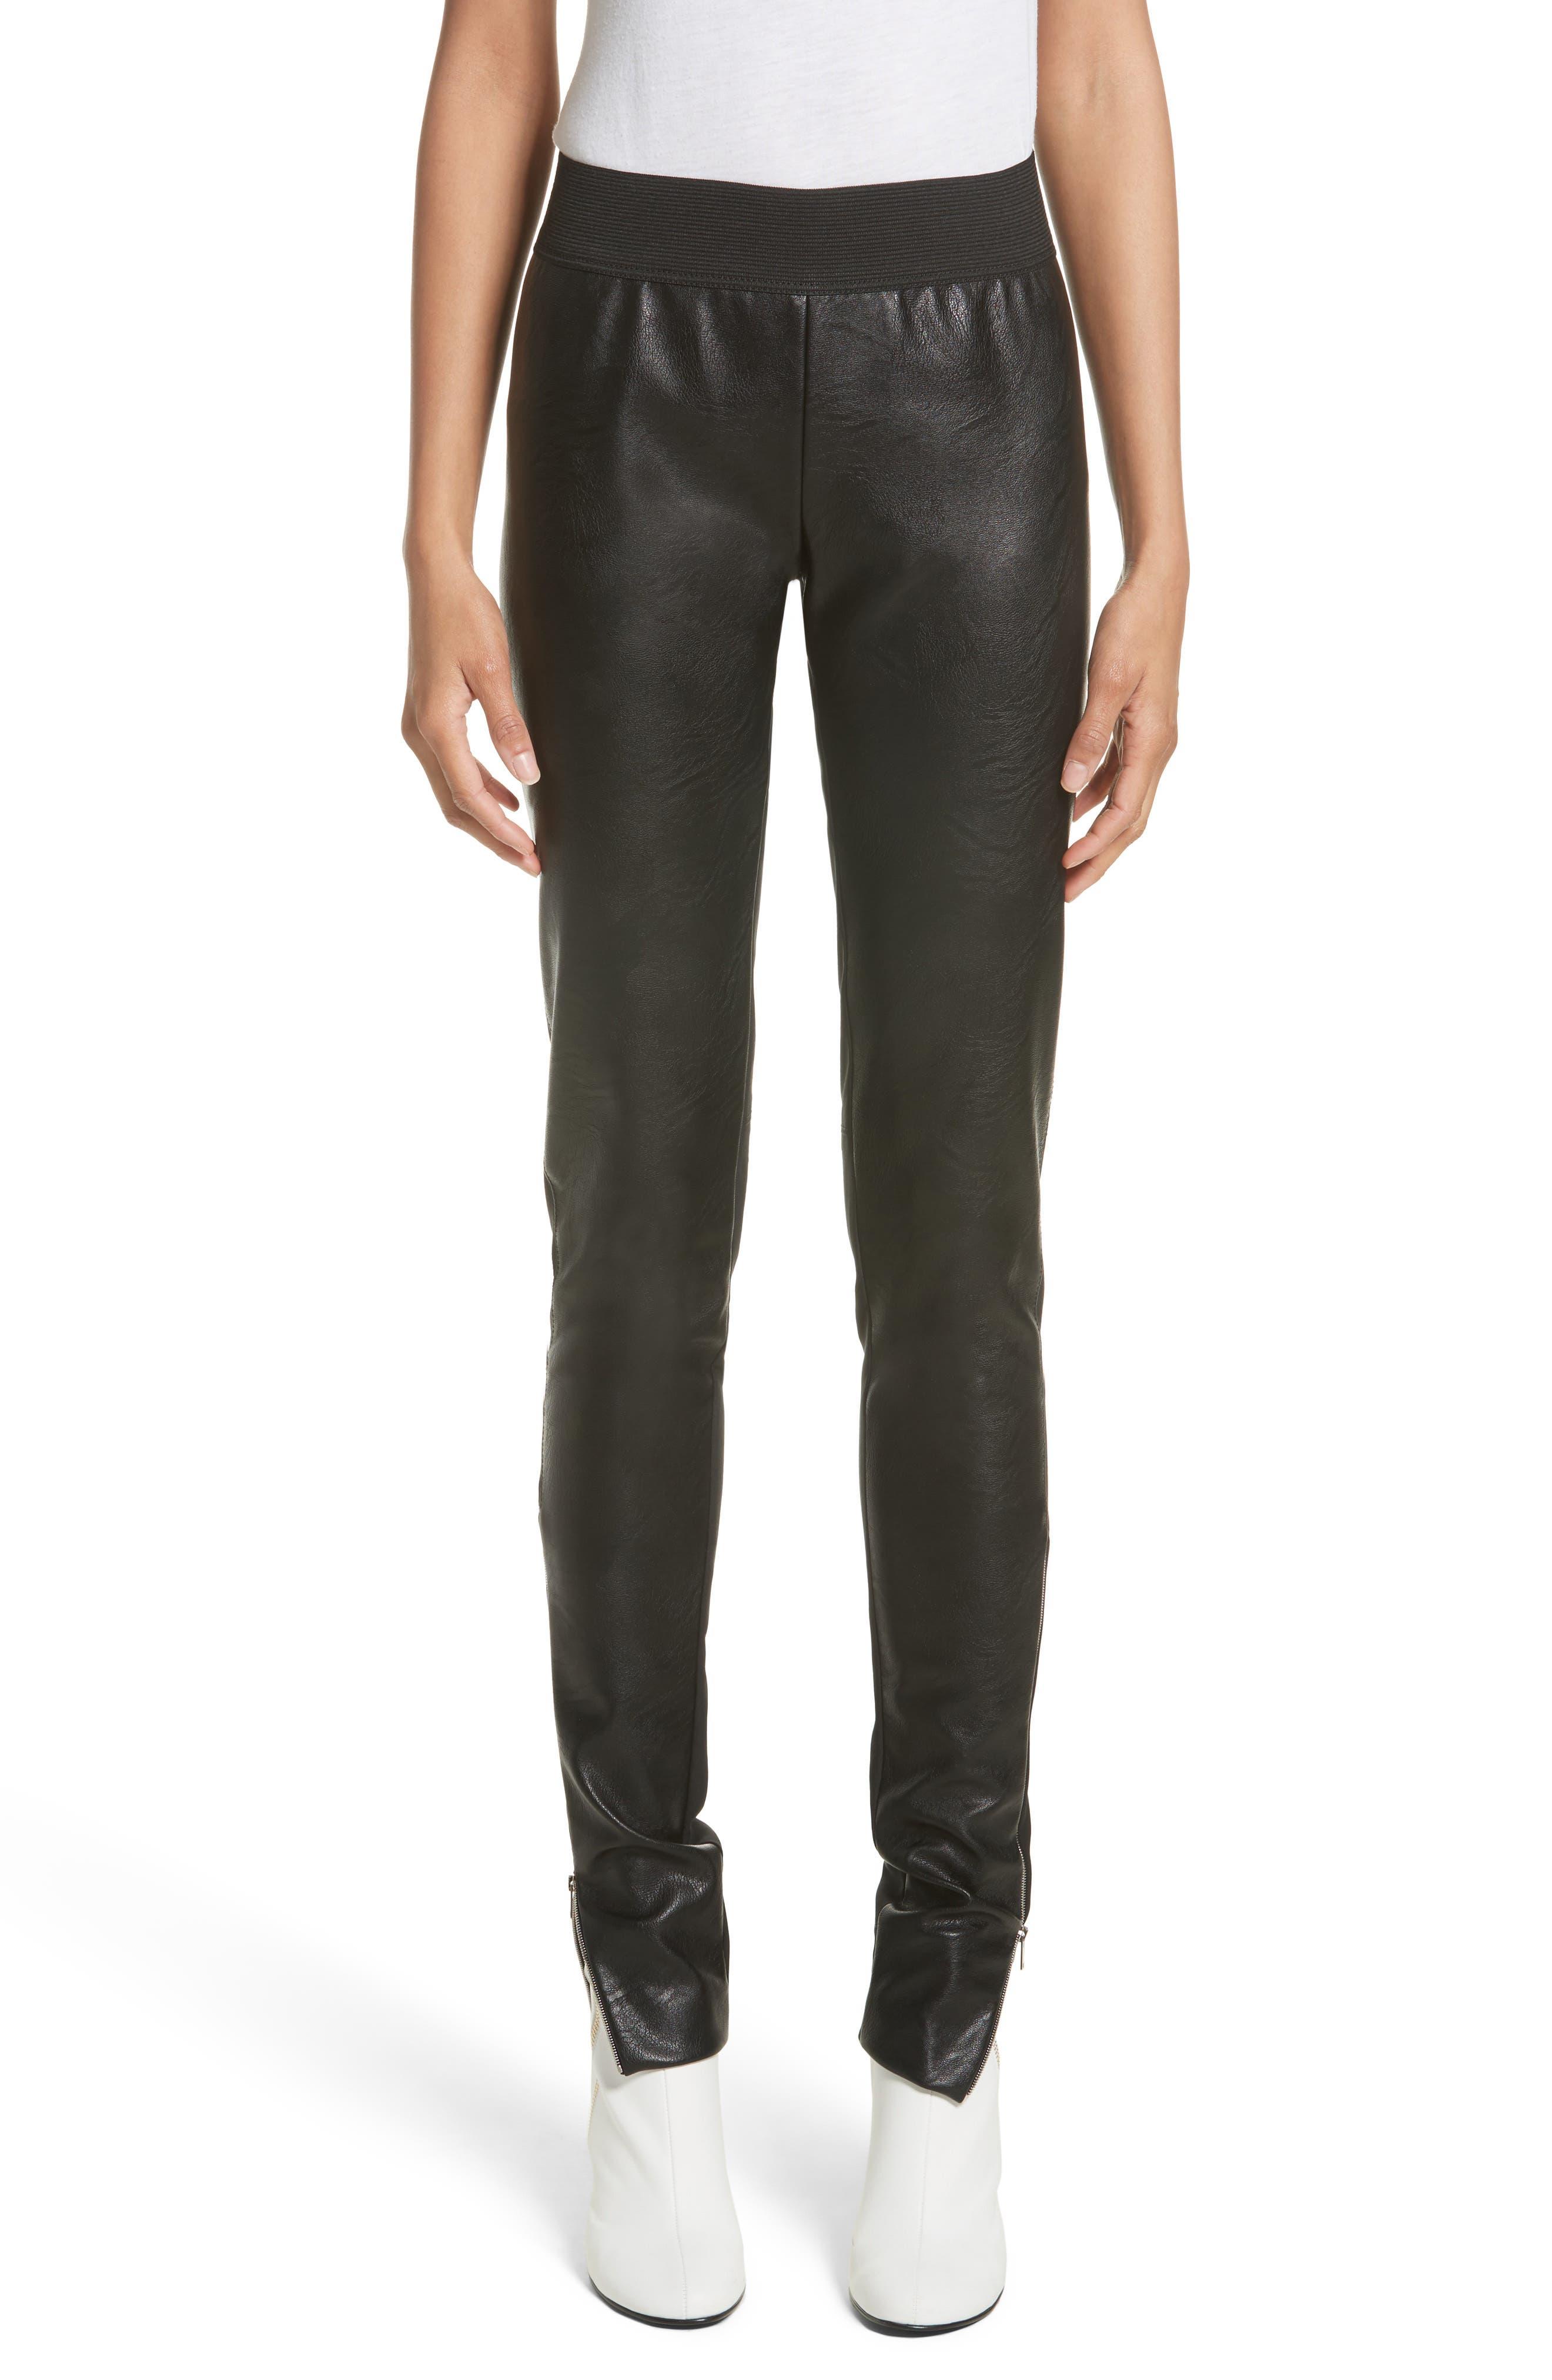 Faux Leather Stretch Leggings,                             Main thumbnail 1, color,                             Black